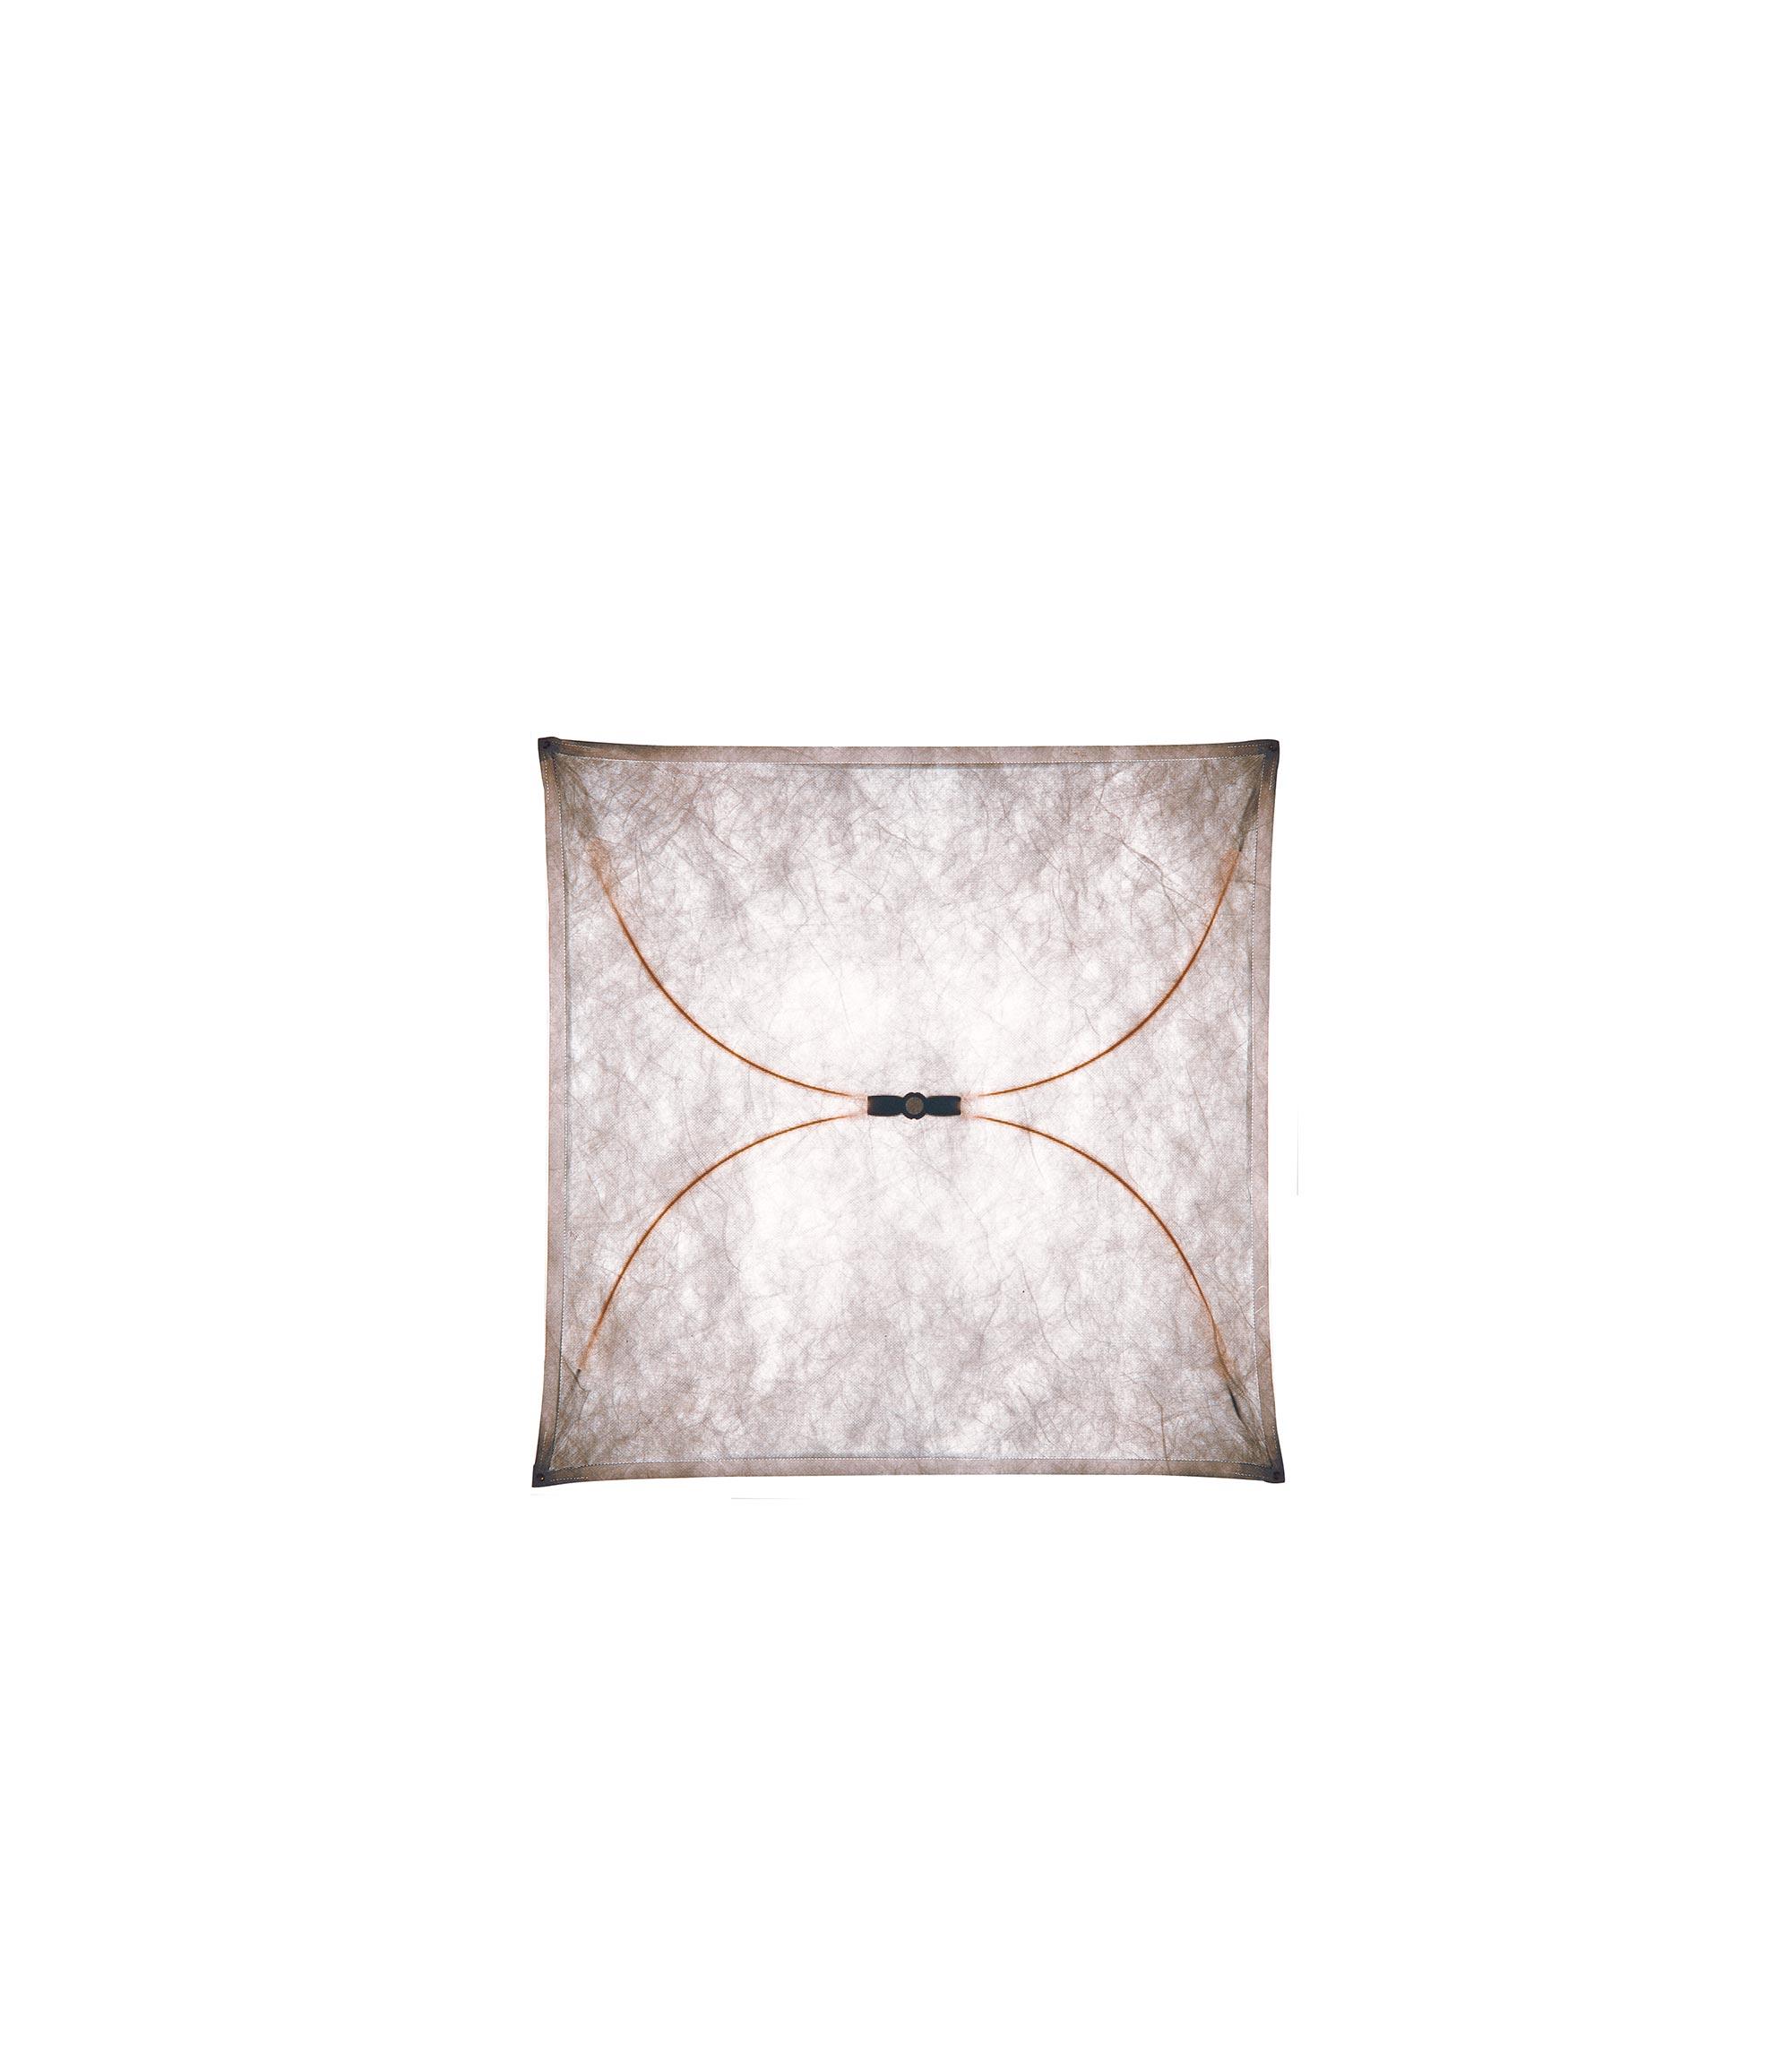 Ariette 3 ceiling wall scarpa flos F06000 product still life big 1